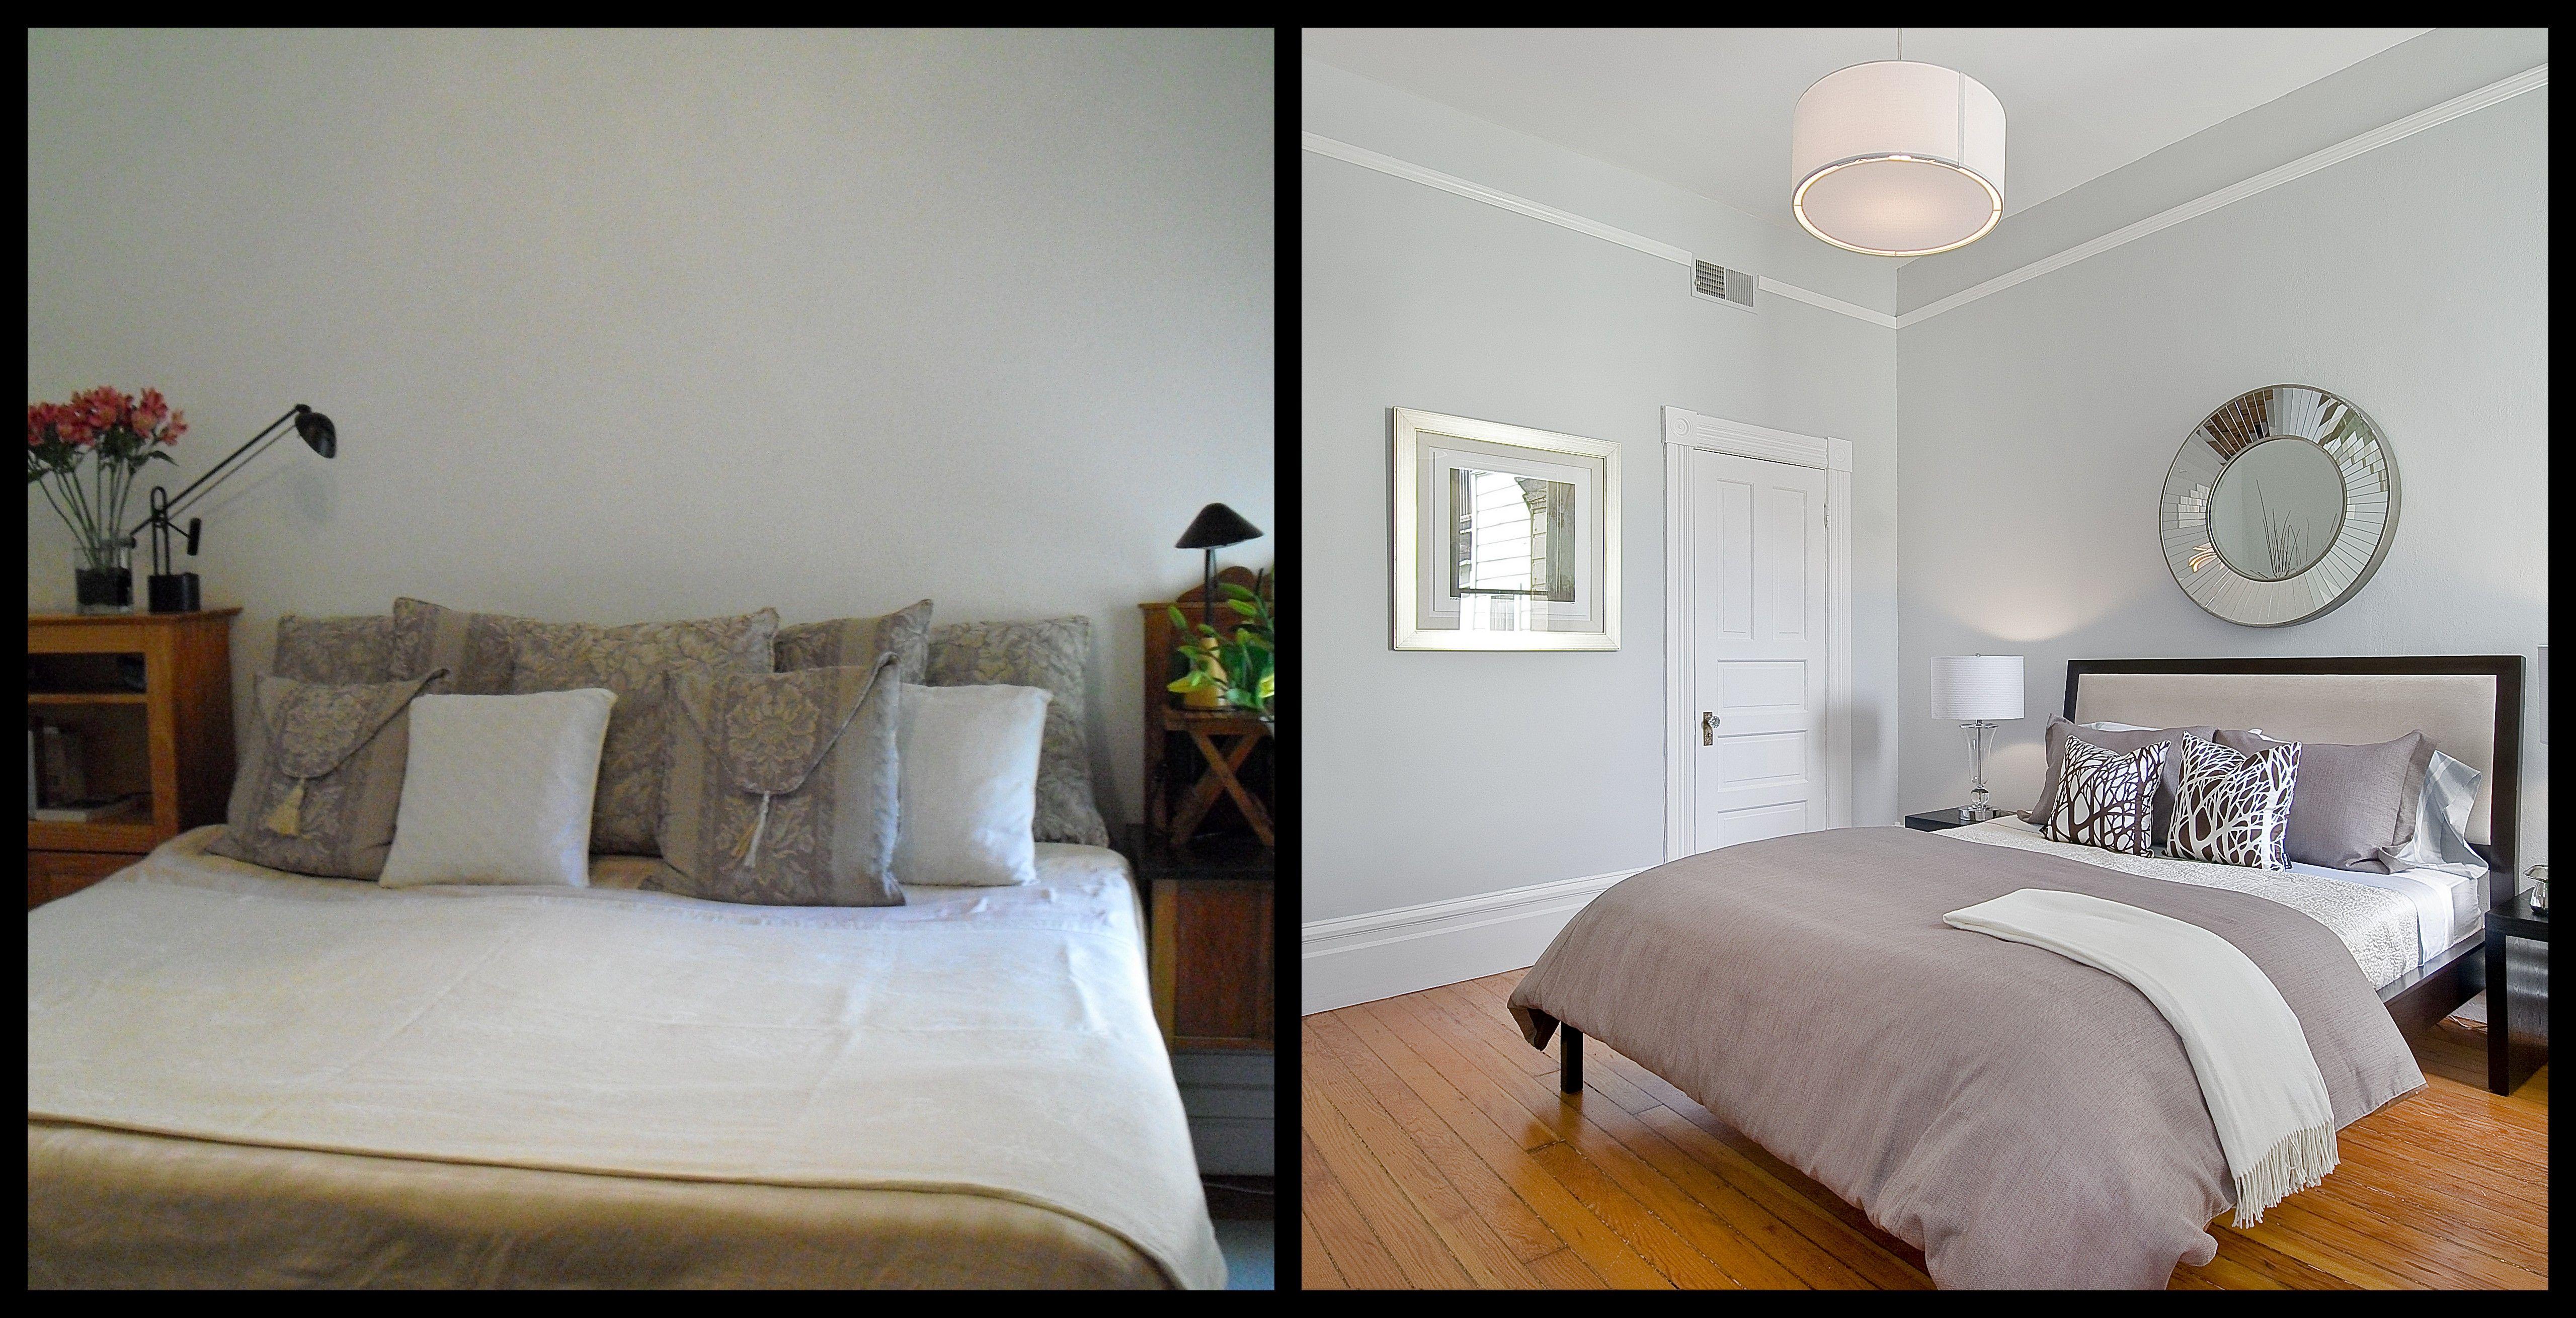 Ceiling Lights For Bedroom Jpg